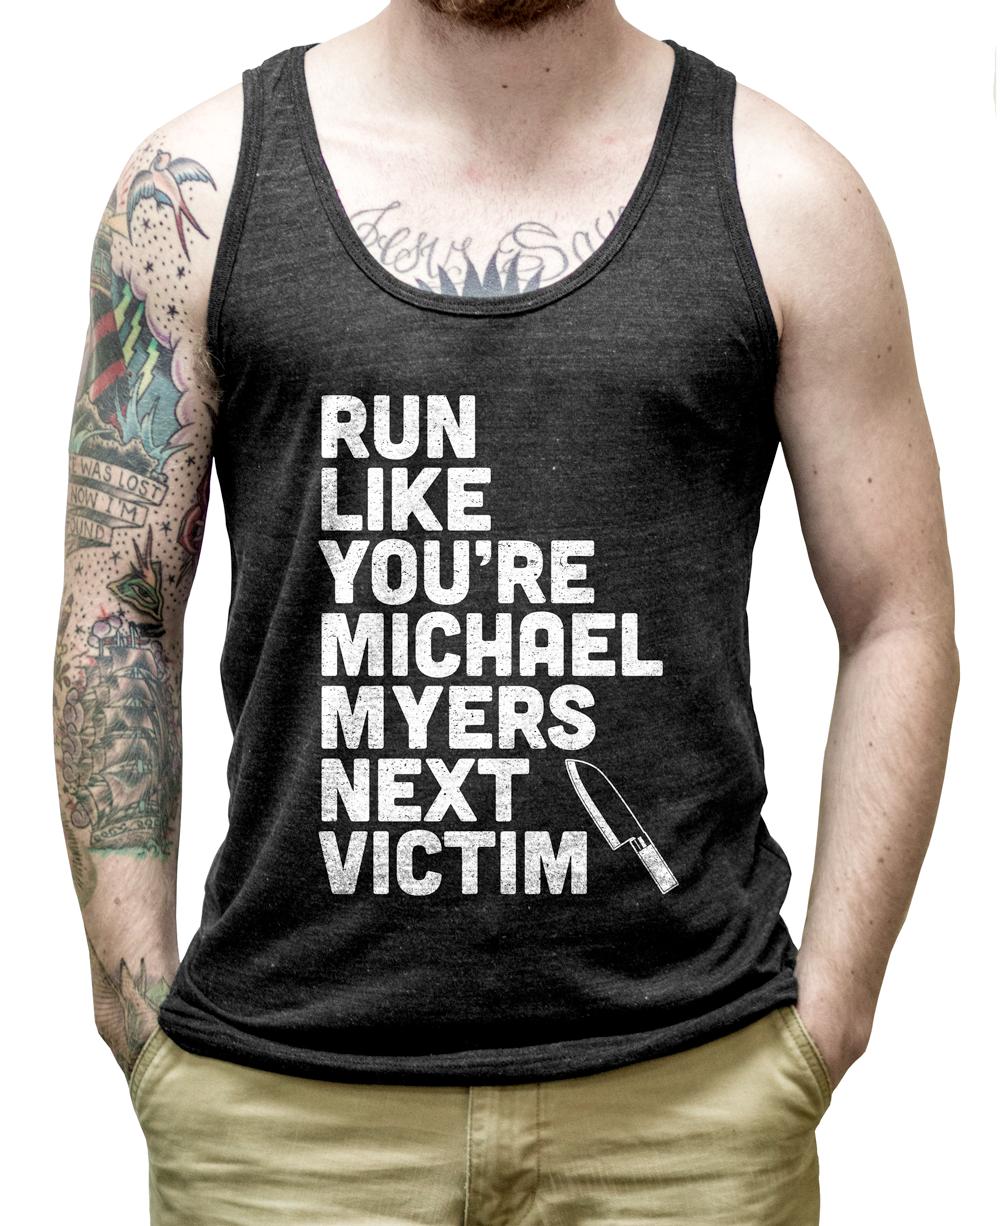 Run Like You're Michael Myers Next Victim on a Tri Black